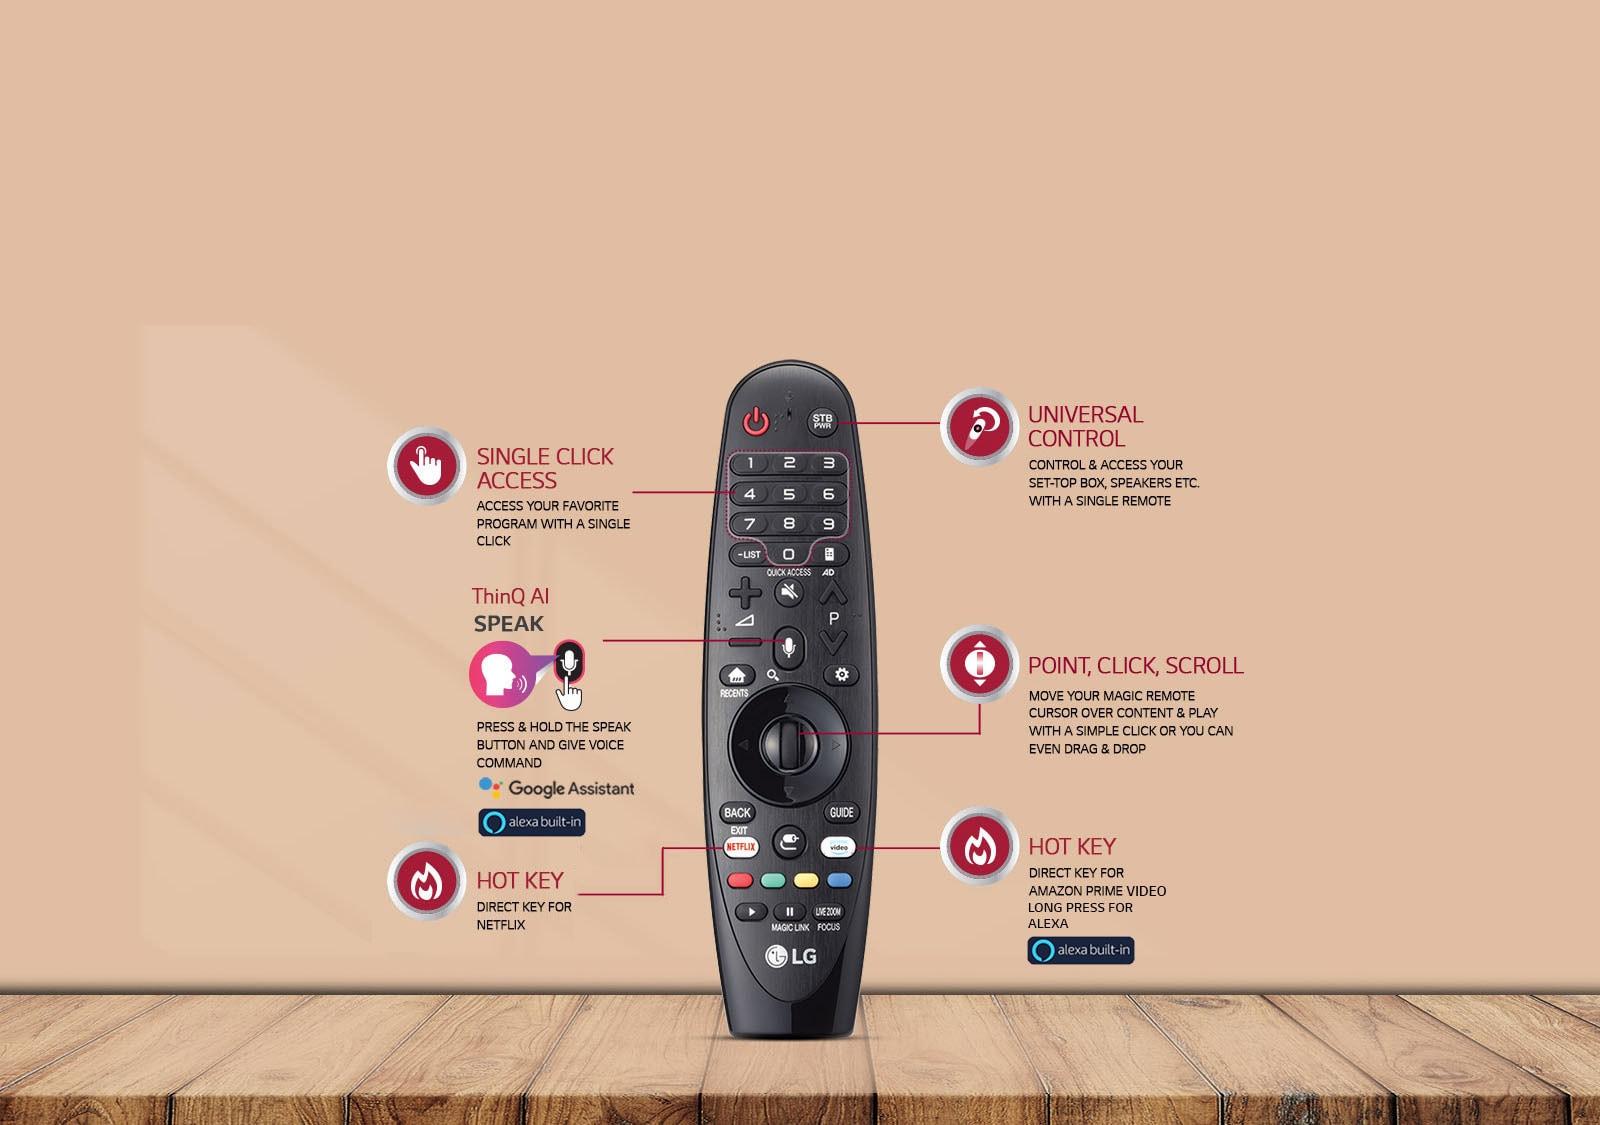 LG Ultra HD TV Magic Remote